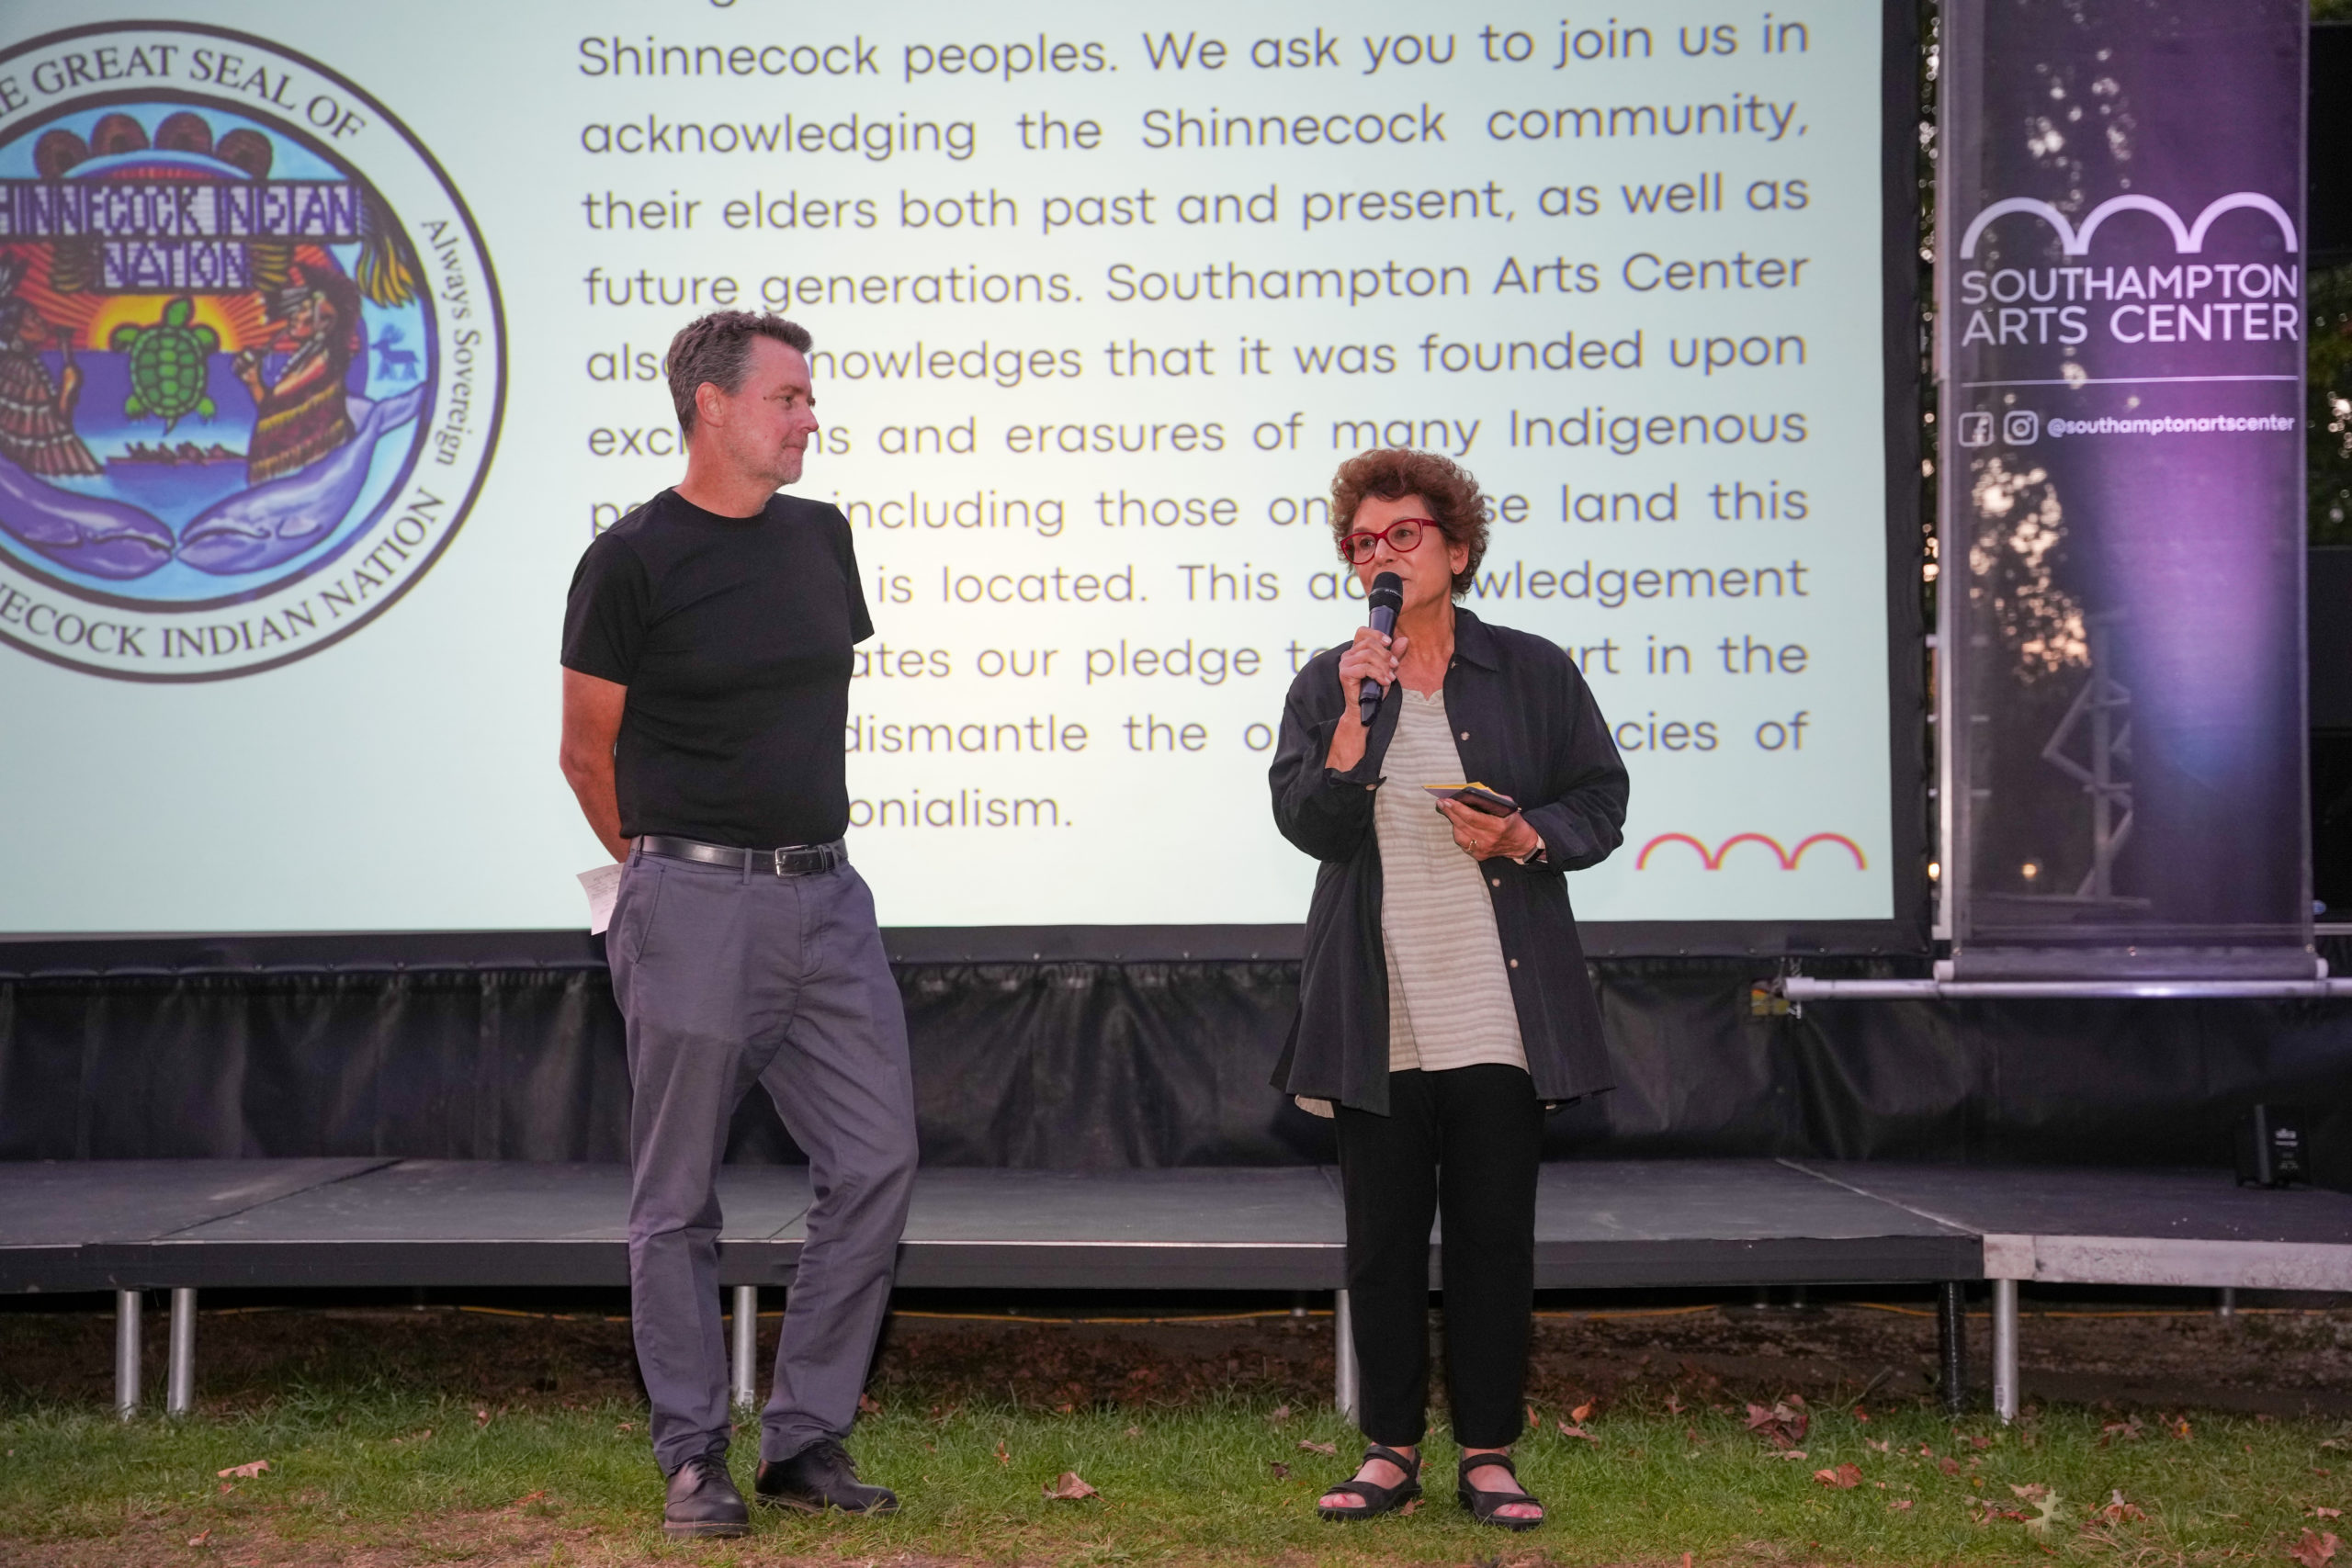 Tom Dunn, executive director of the Southampton Arts Center, left, and Jacqui Lofaro, executive director of Hamptons Doc Fest, open Friday night's festivities.